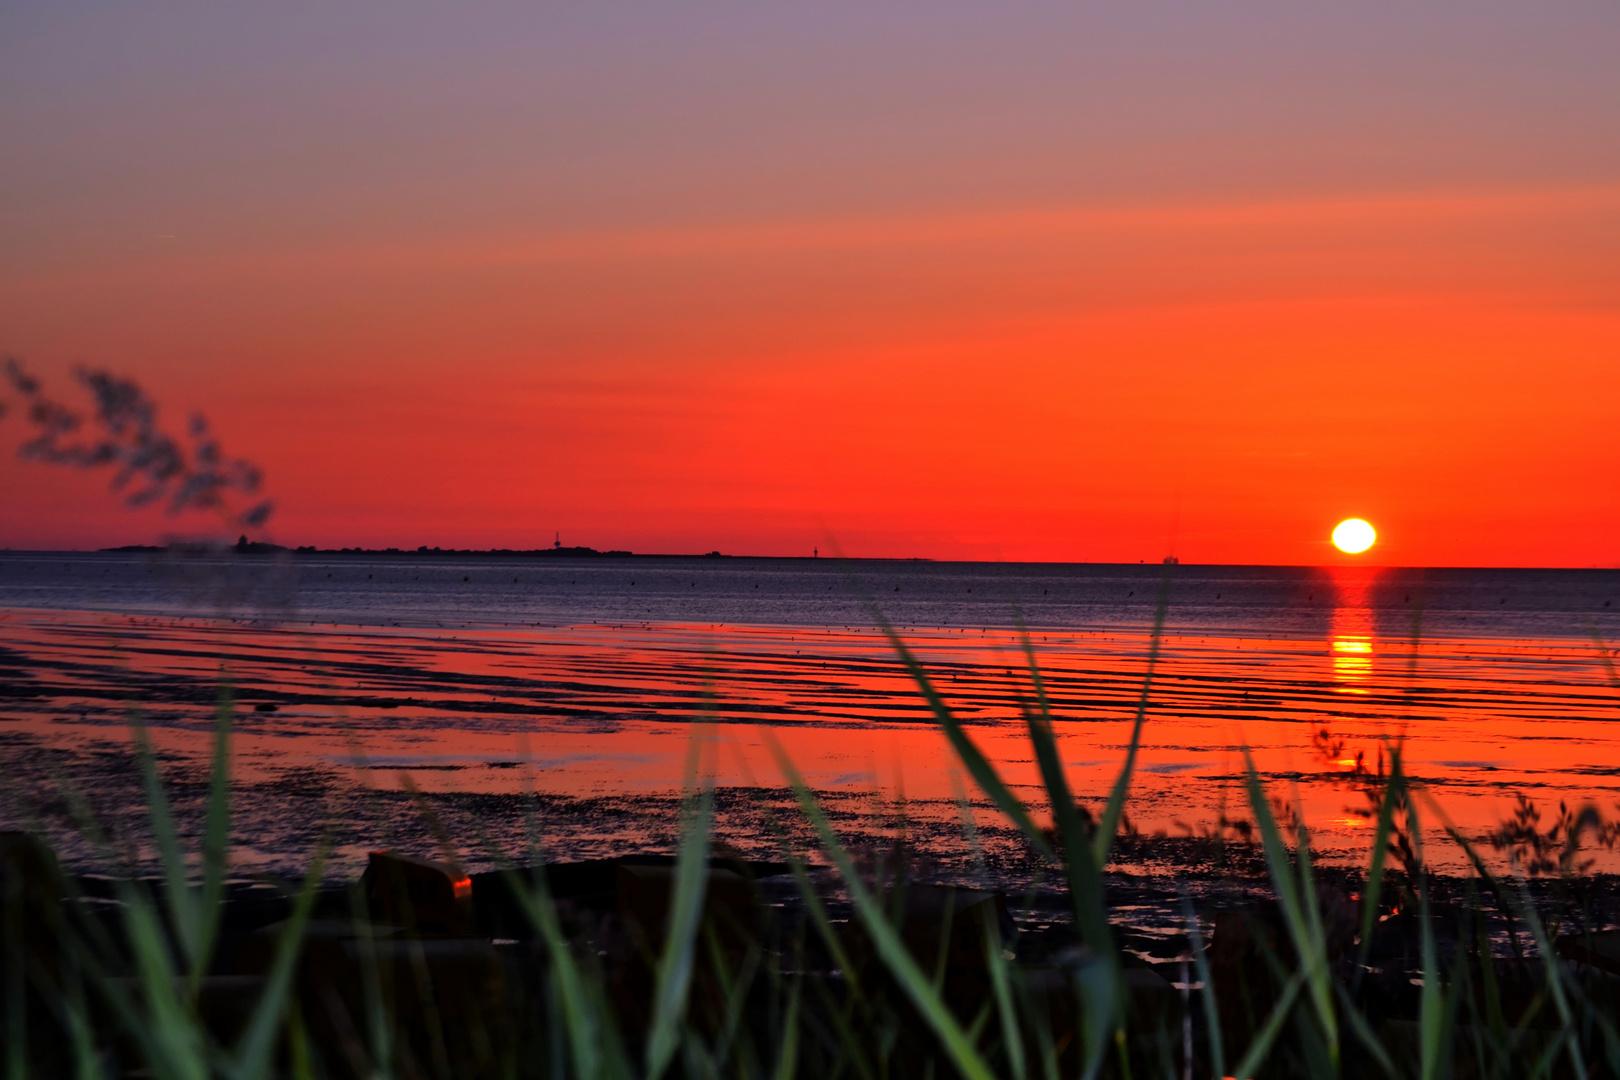 Sonnenuntergang Cuxhaven